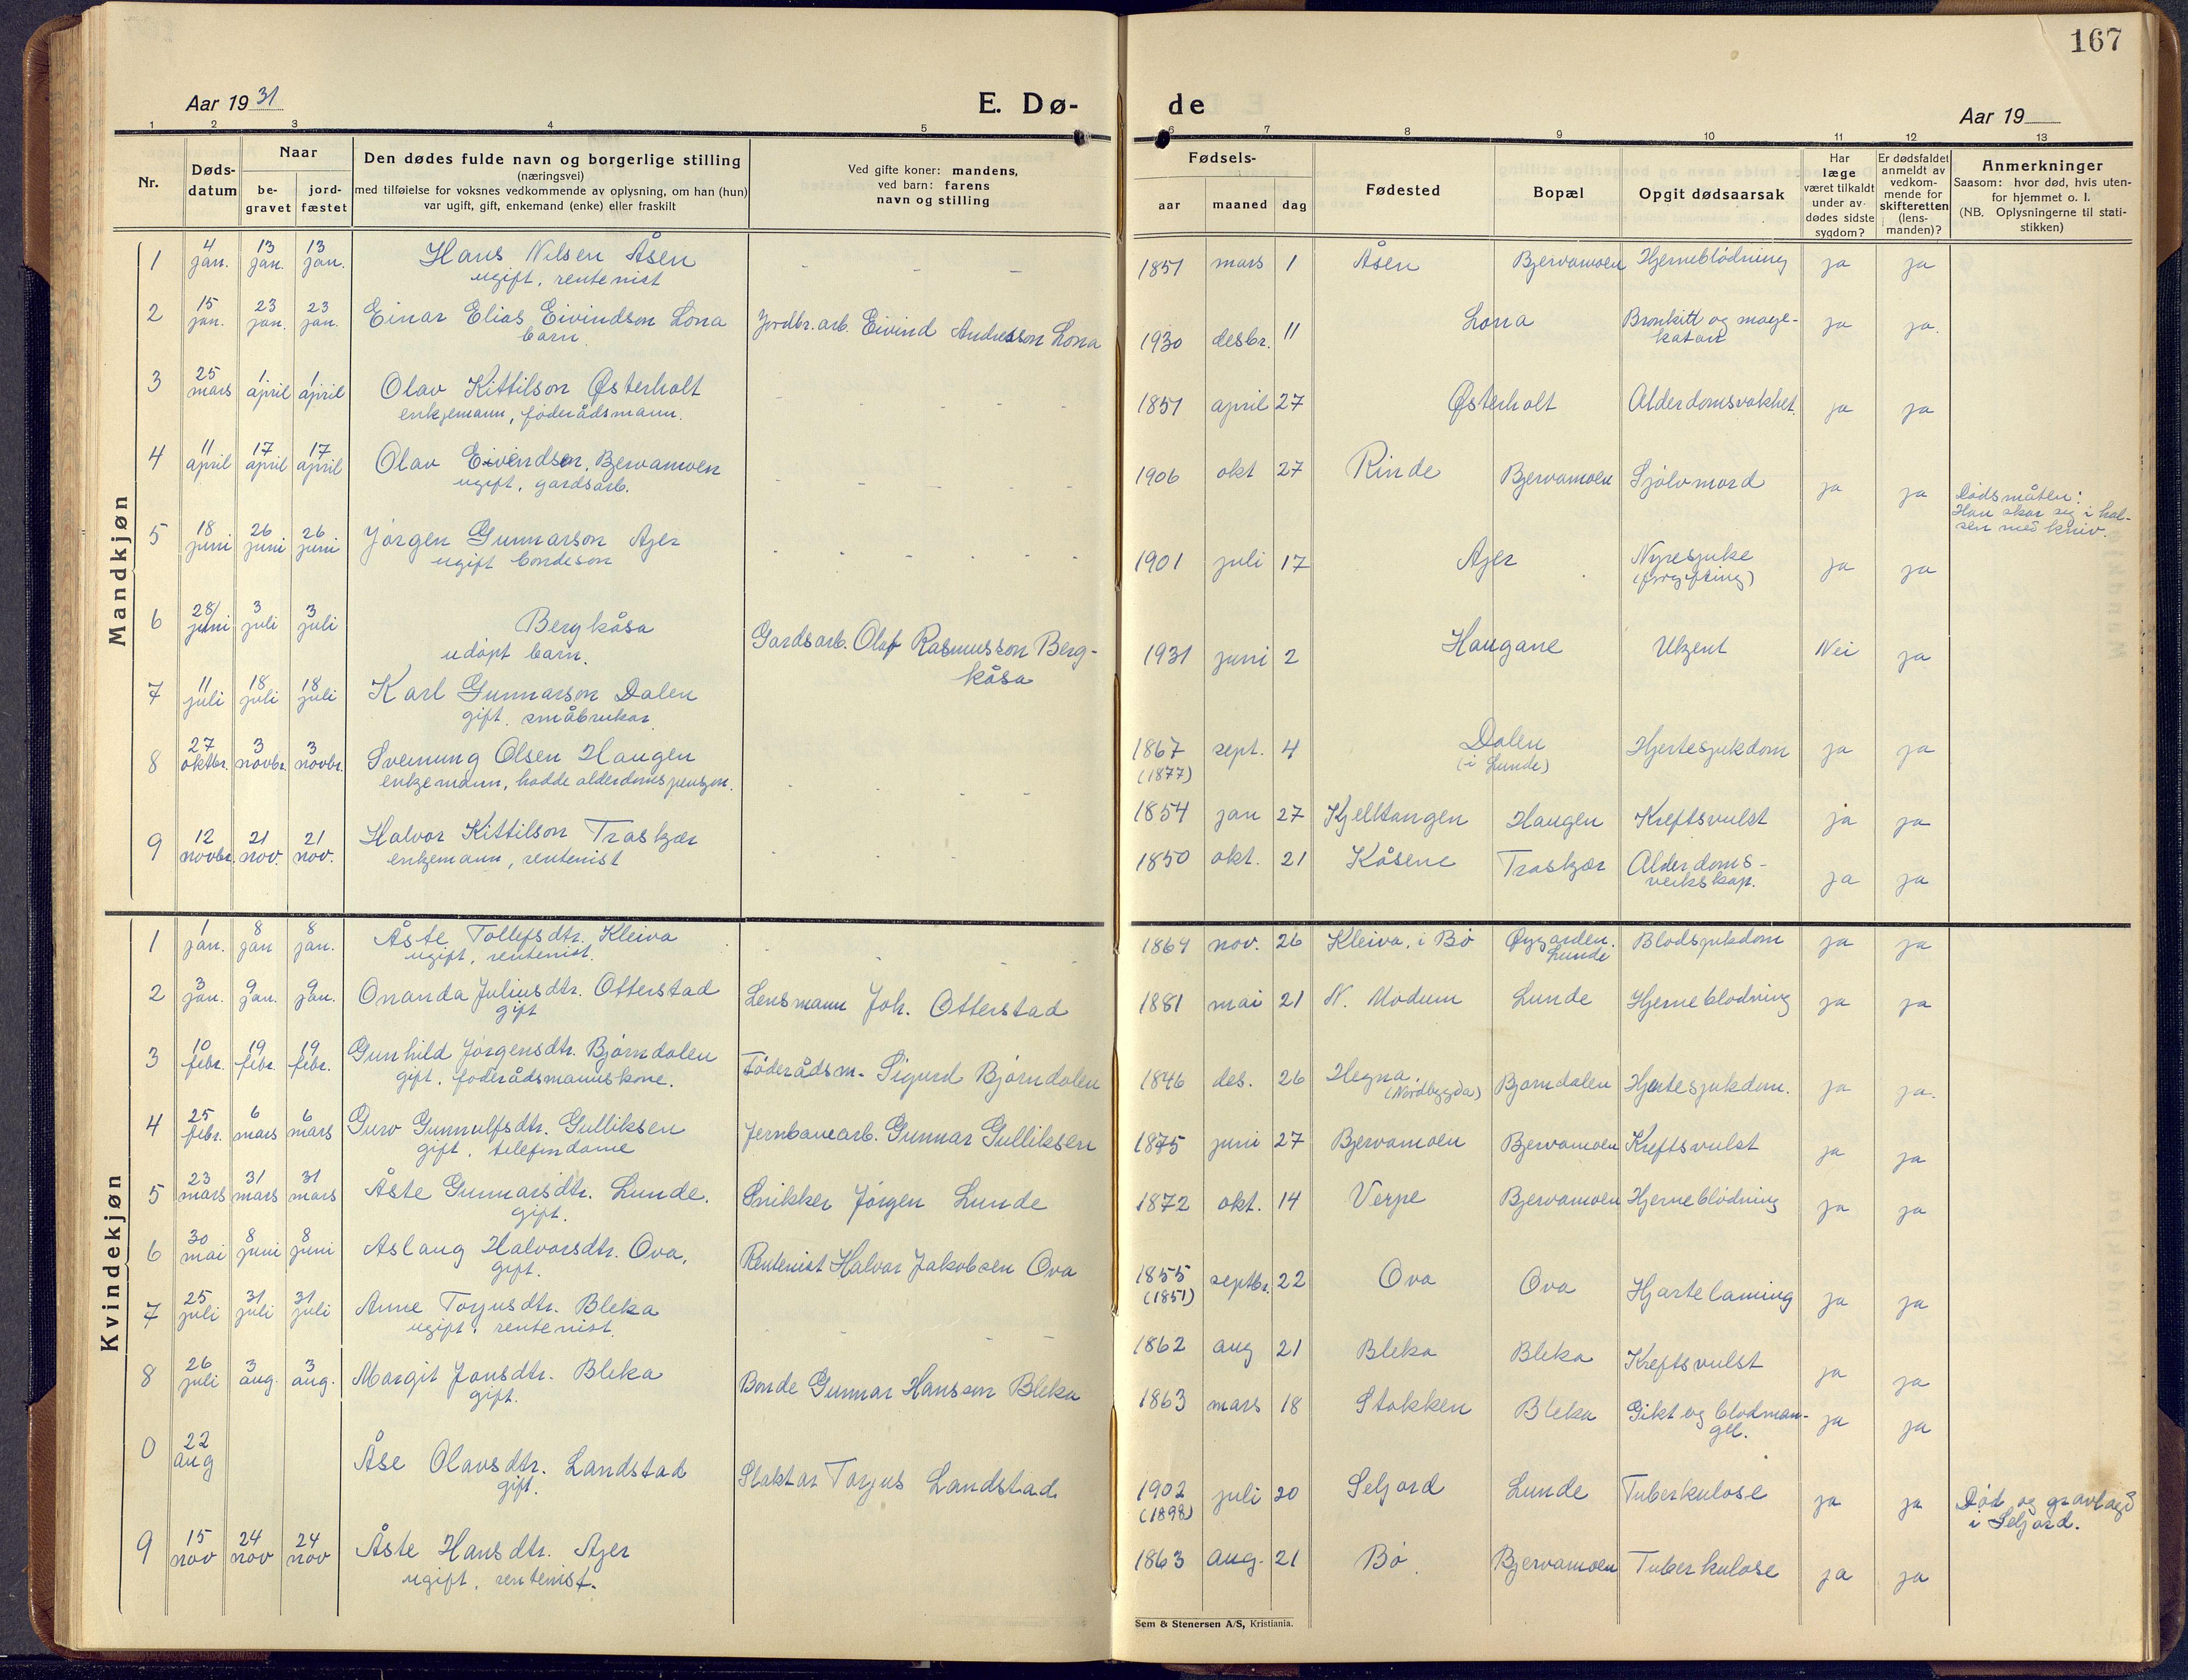 SAKO, Lunde kirkebøker, F/Fa/L0006: Ministerialbok nr. I 6, 1922-1940, s. 167